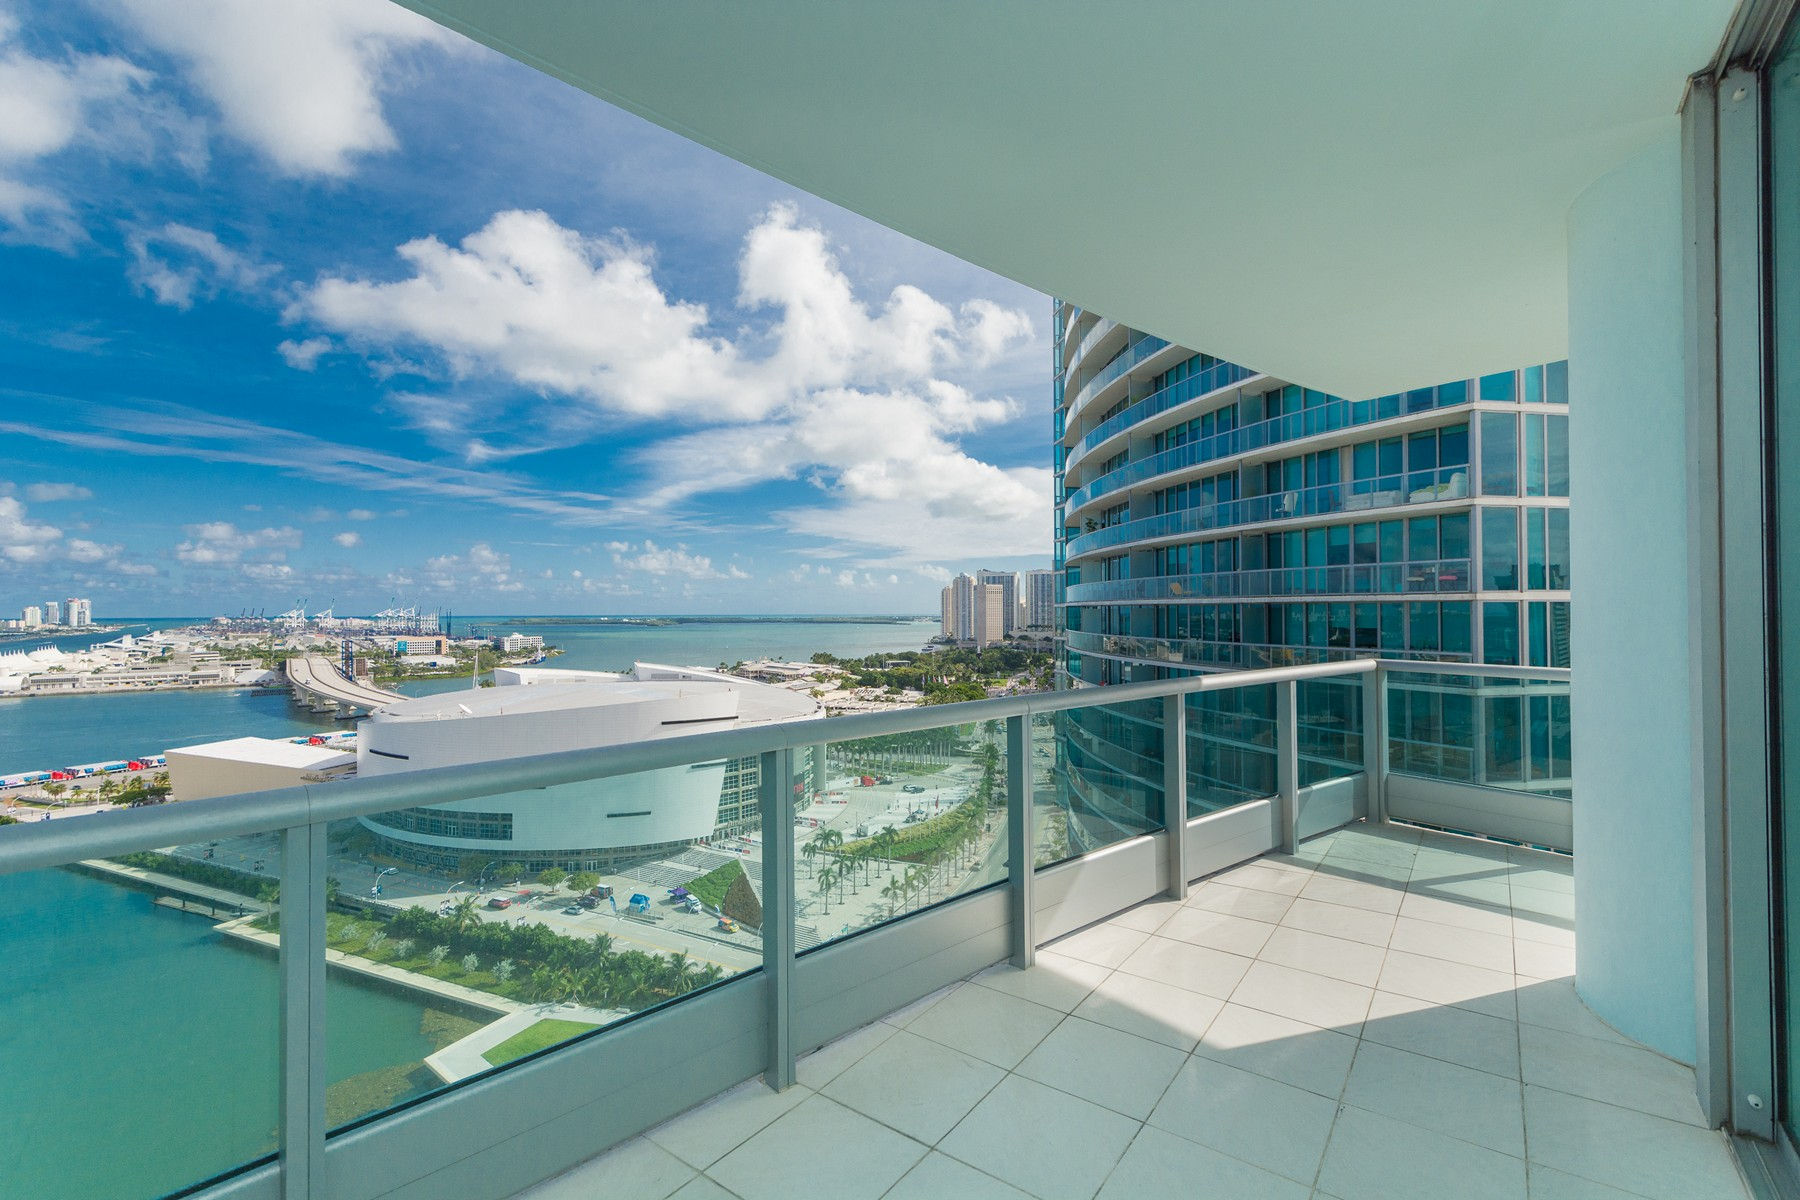 Condominium for Sale at 900 Biscayne Blvd #2501 900 Biscayne Bl 2501 Miami, Florida, 33132 United States